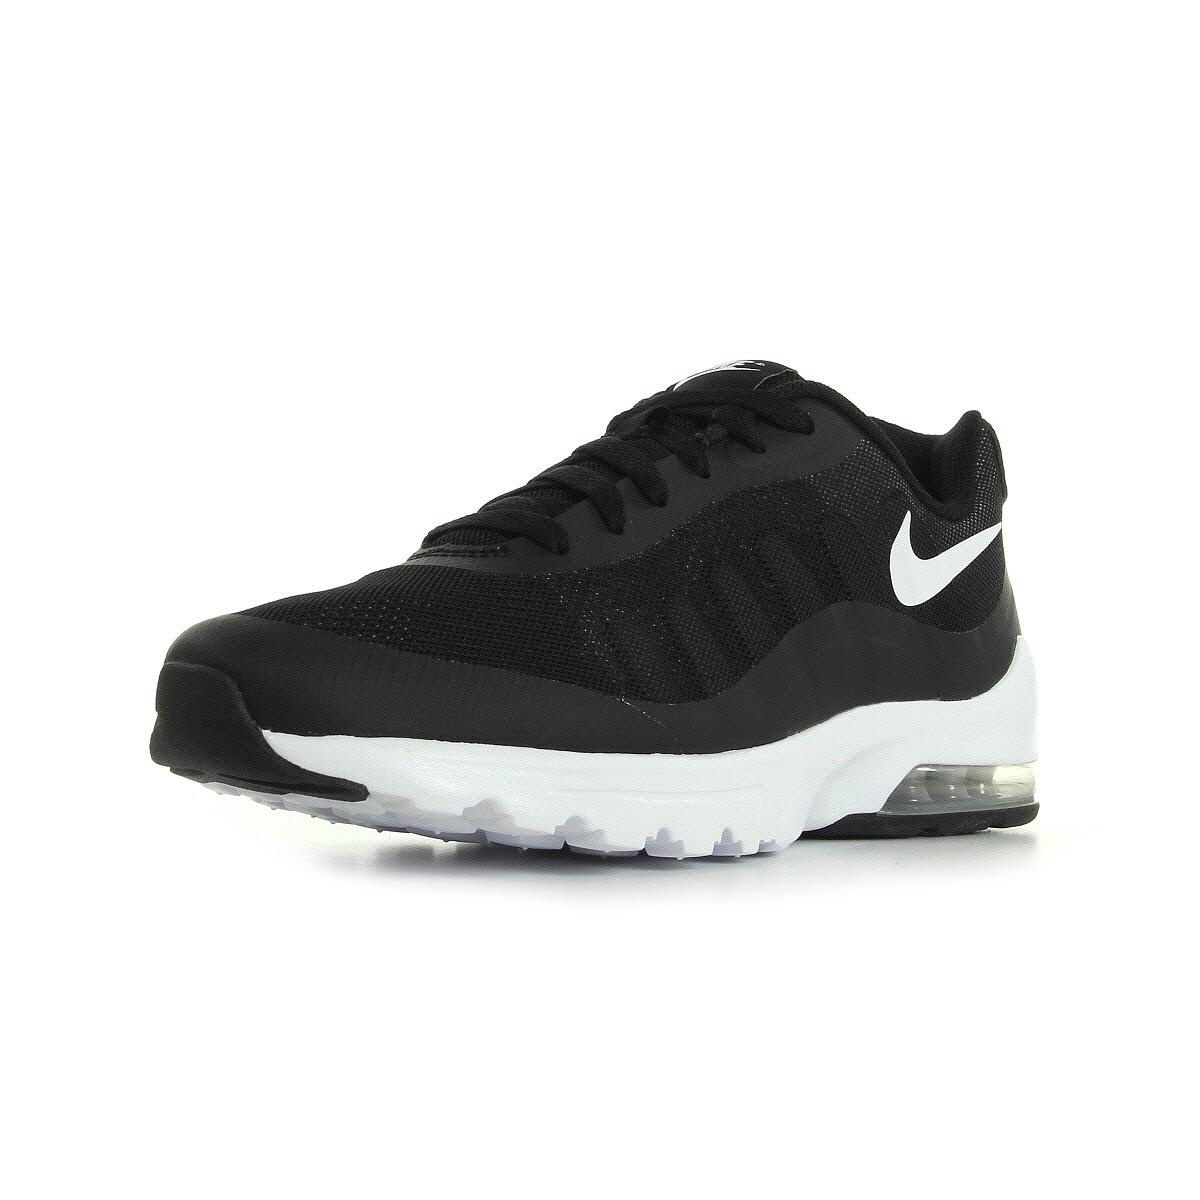 tous les crampons de football de jeunes nike - Nike Air Max Invigor 749680010, Baskets mode homme